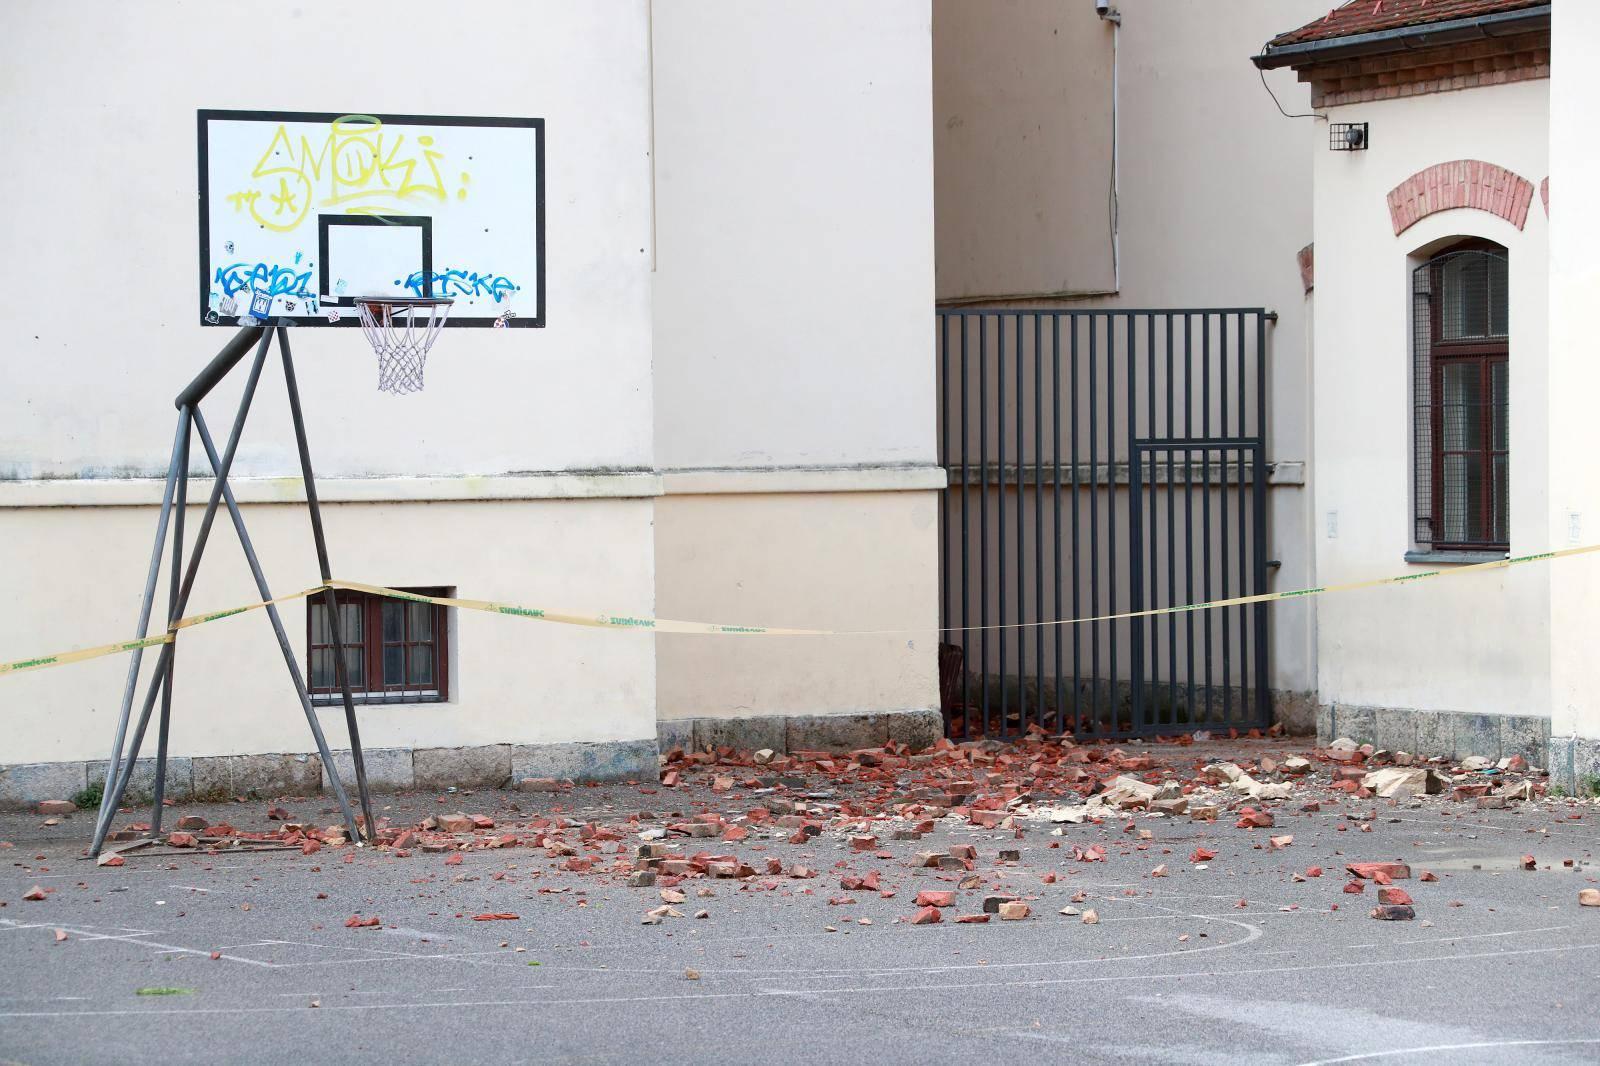 Zagreb: Vidljive posljedice potresa na  osnovnoj školi Josipa Jurja Strossmayera